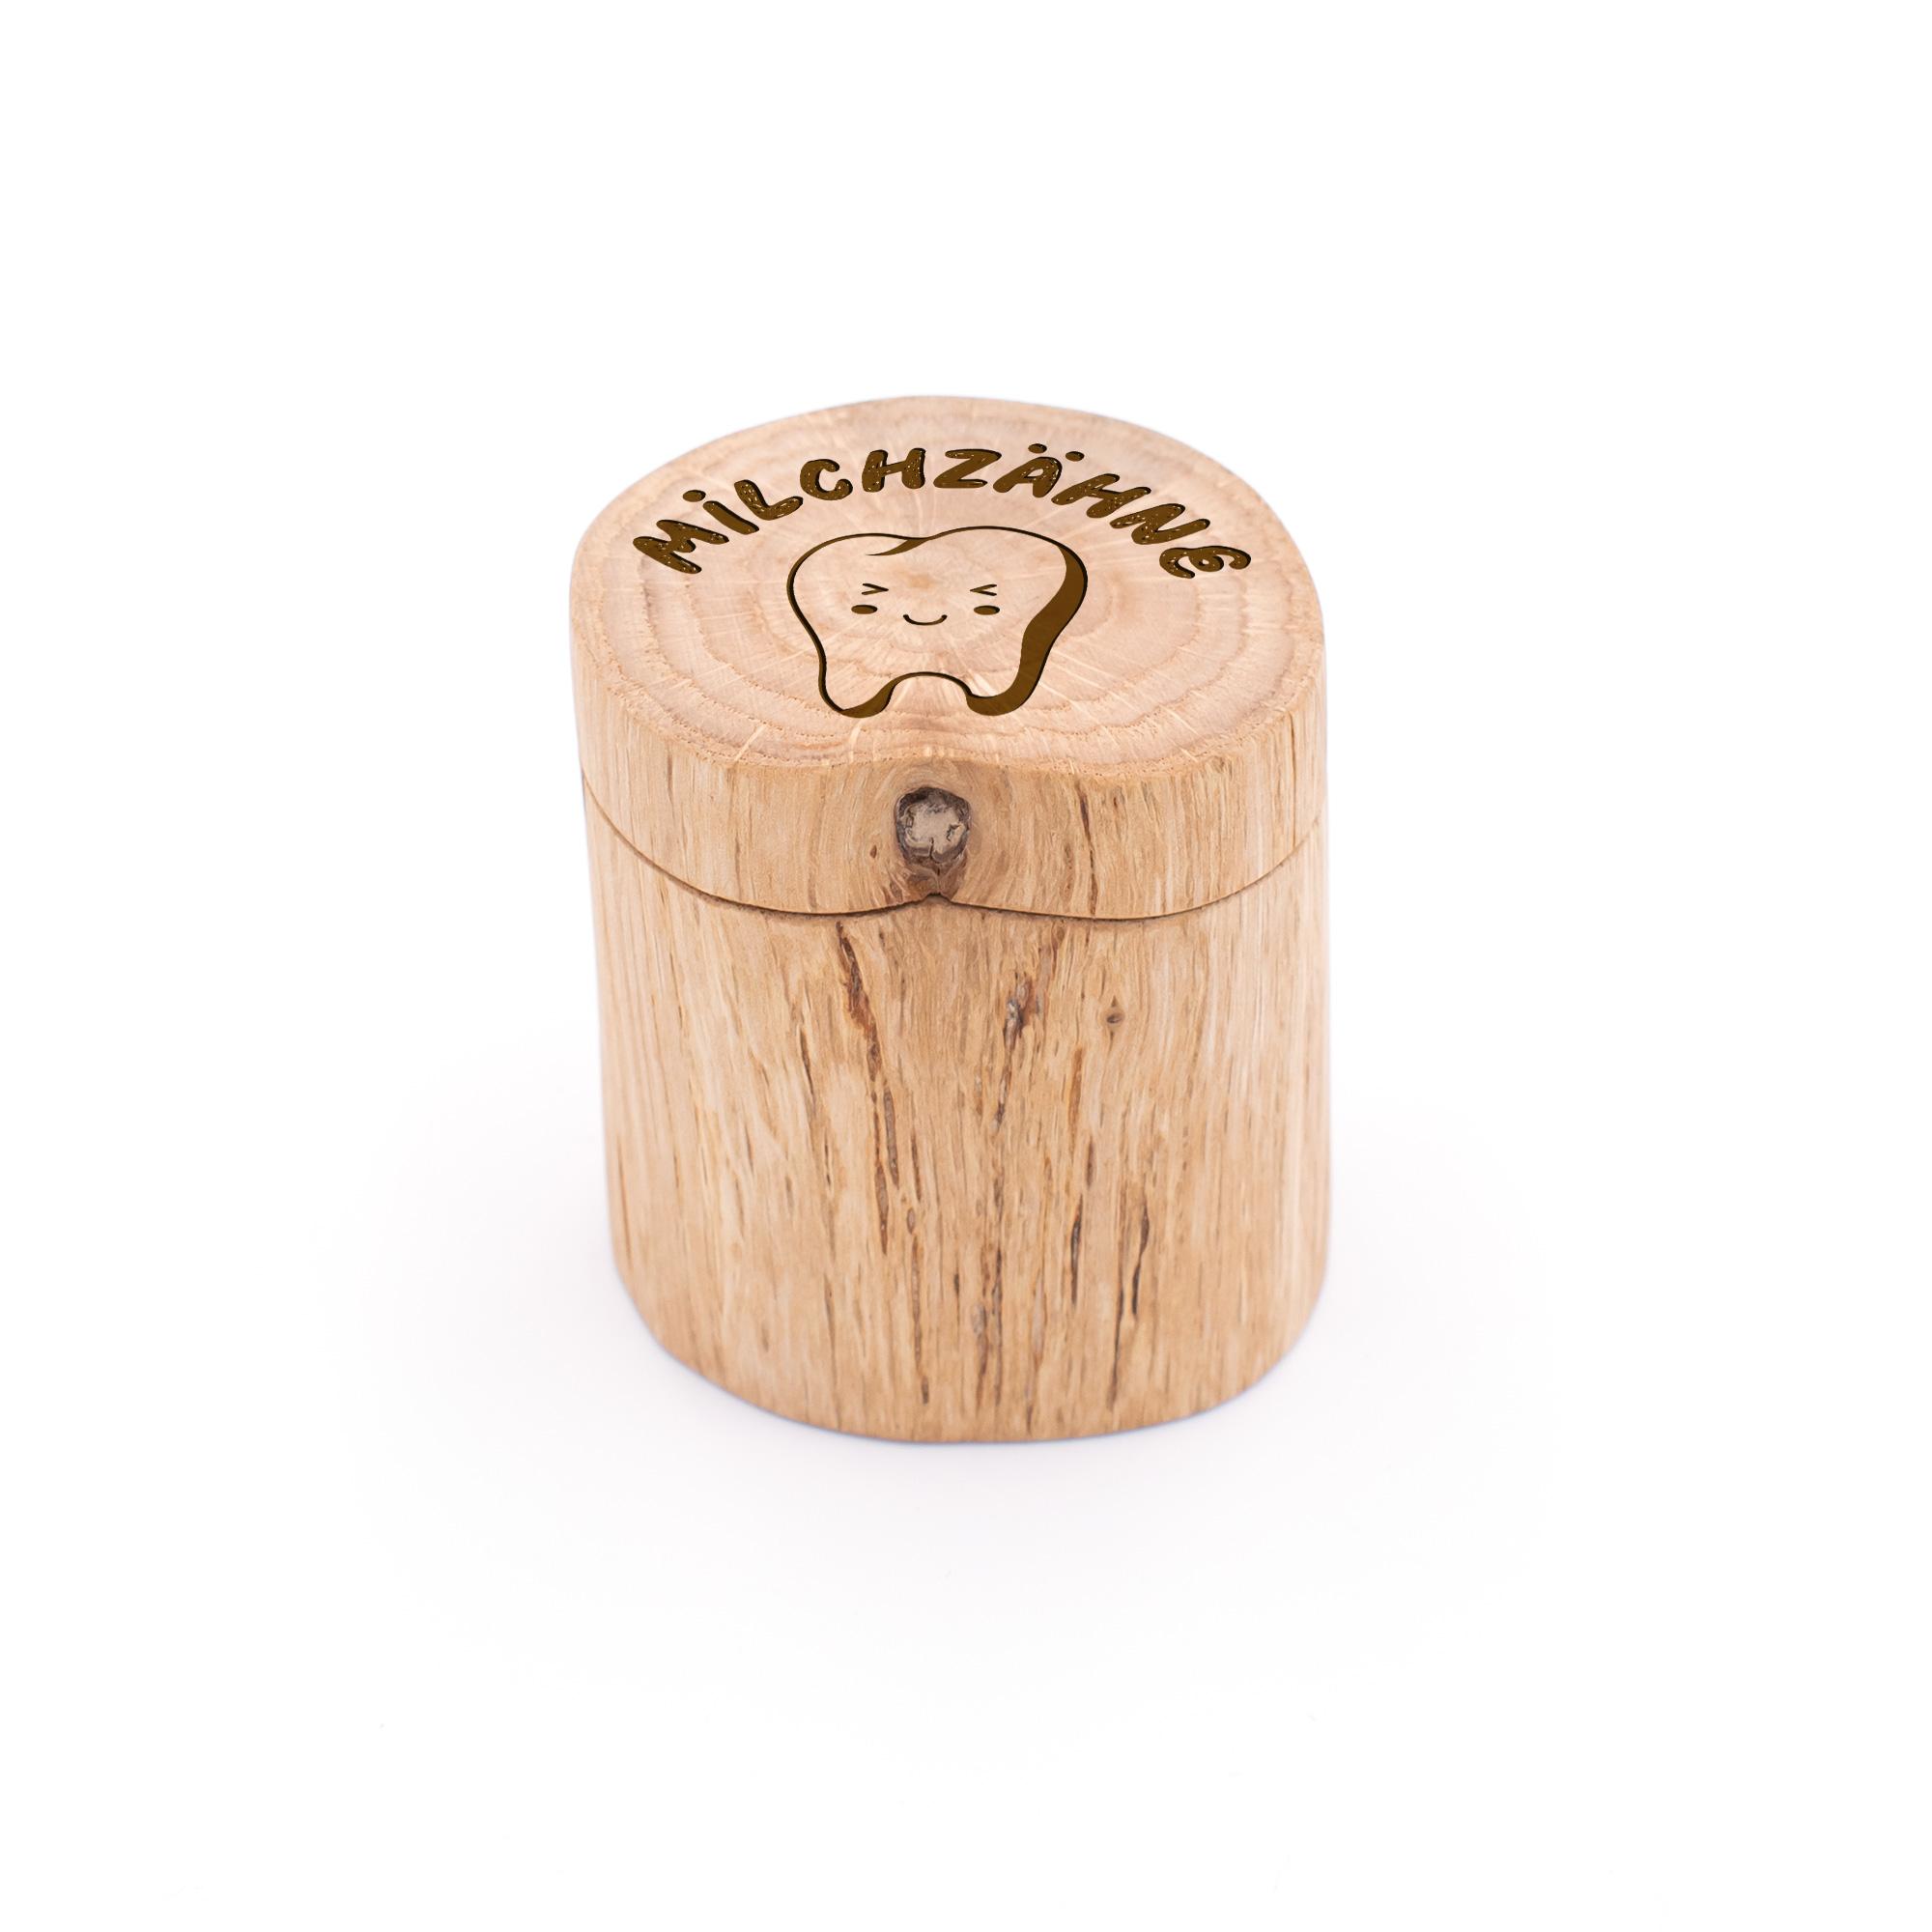 Milchzahndose mit niedlichem Zahnmotiv aus Eiche-Holz